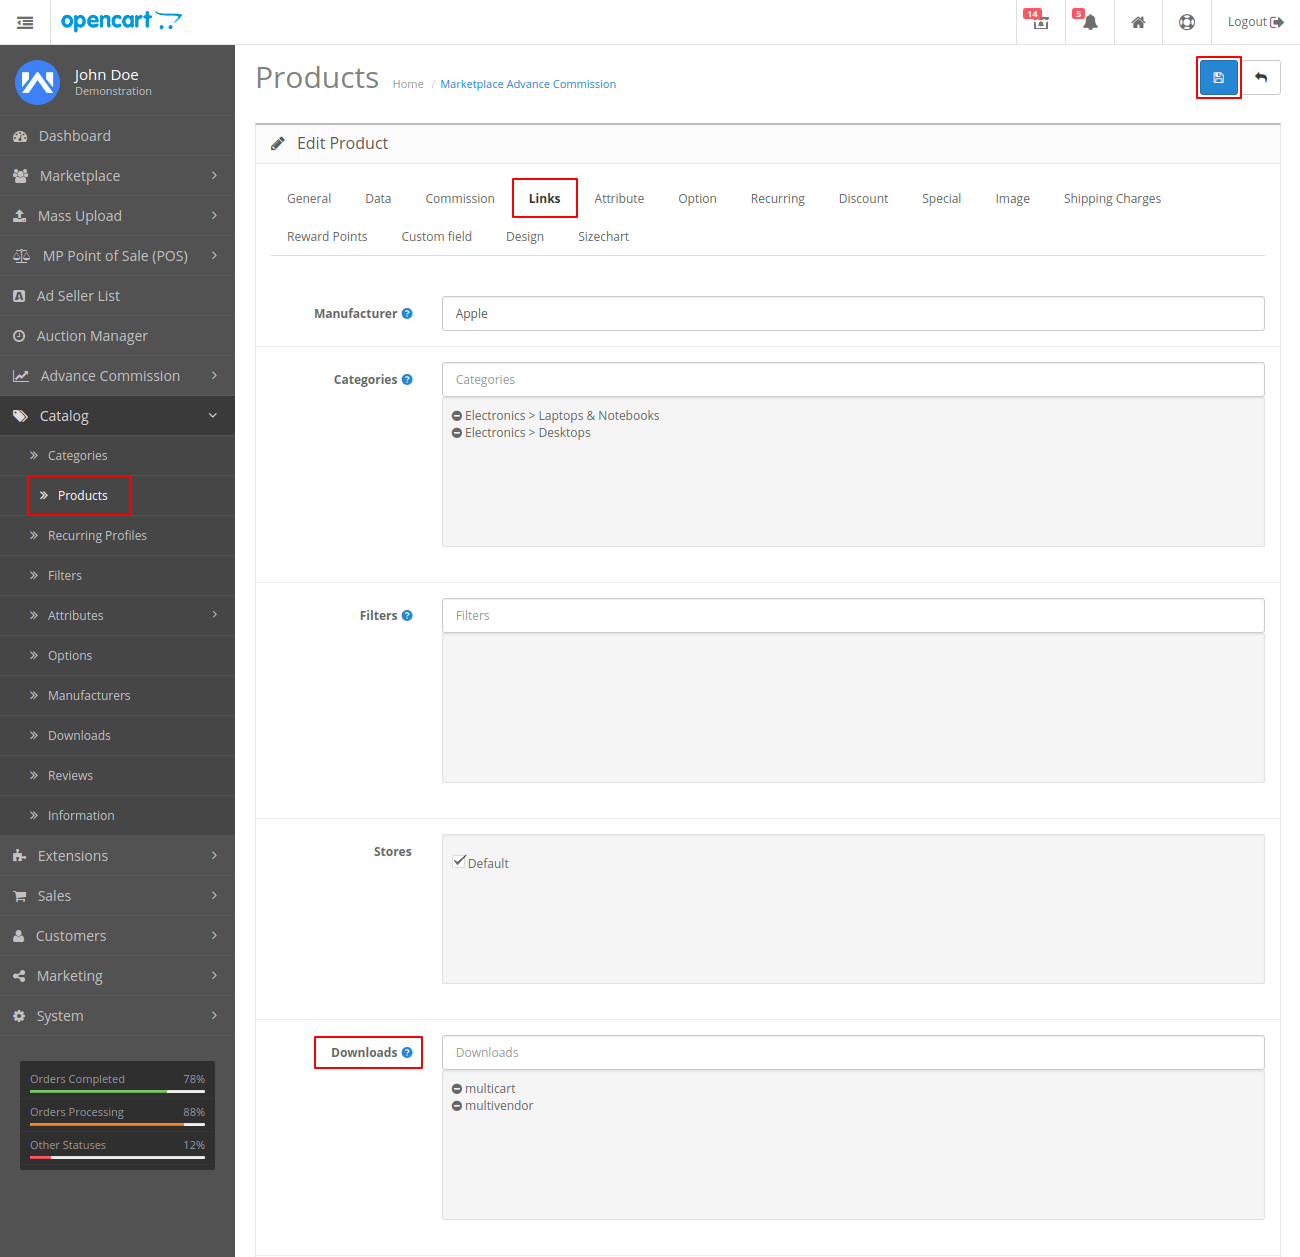 webkul-opencart-multi-vendor-amazon-s3-module-creating-downloadable-product-link-admin-end